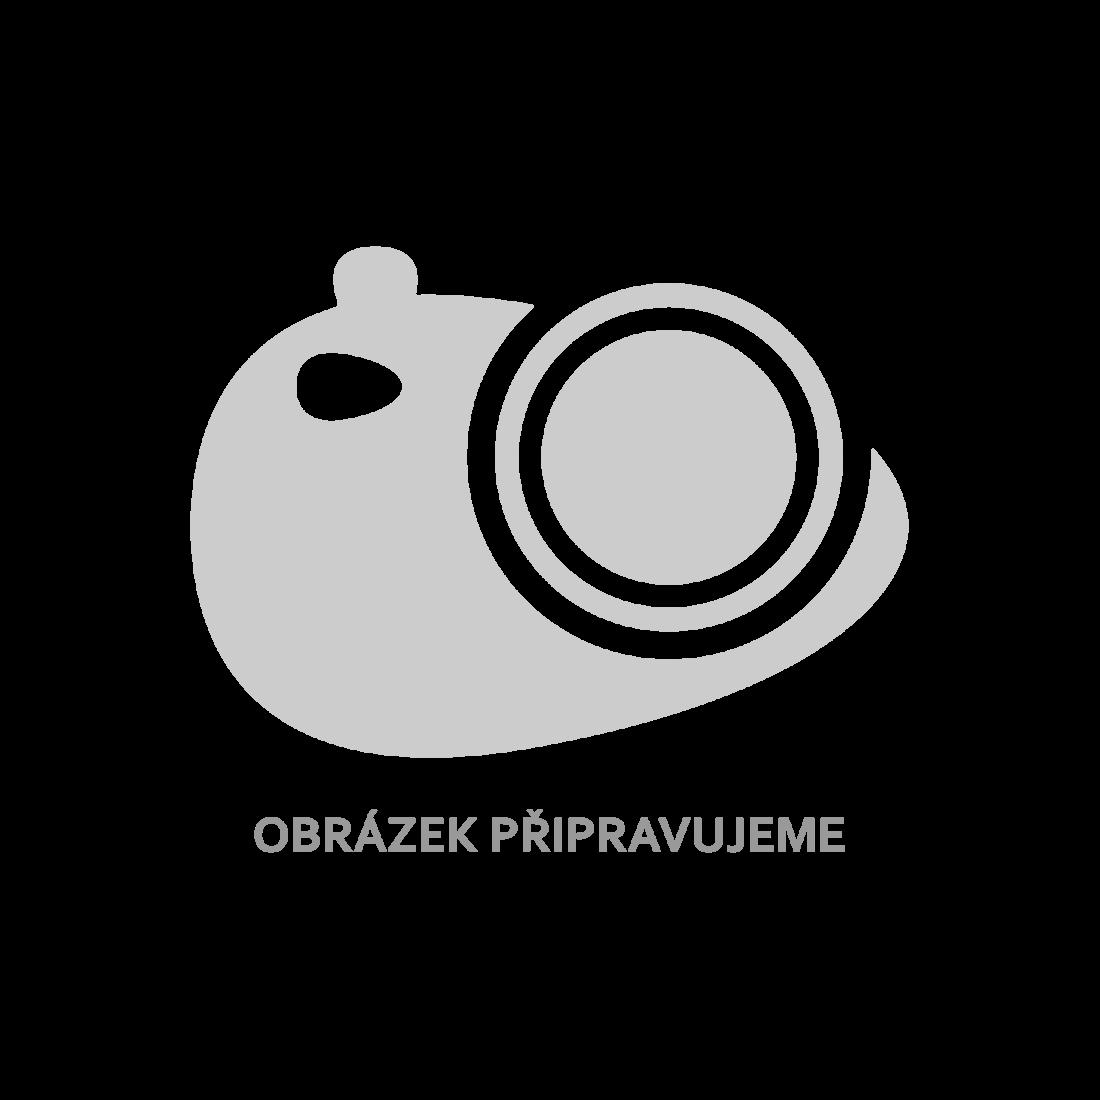 vidaXL Kancelářská skříň 90 x 40 x 140 cm ocelová šedá [244649]